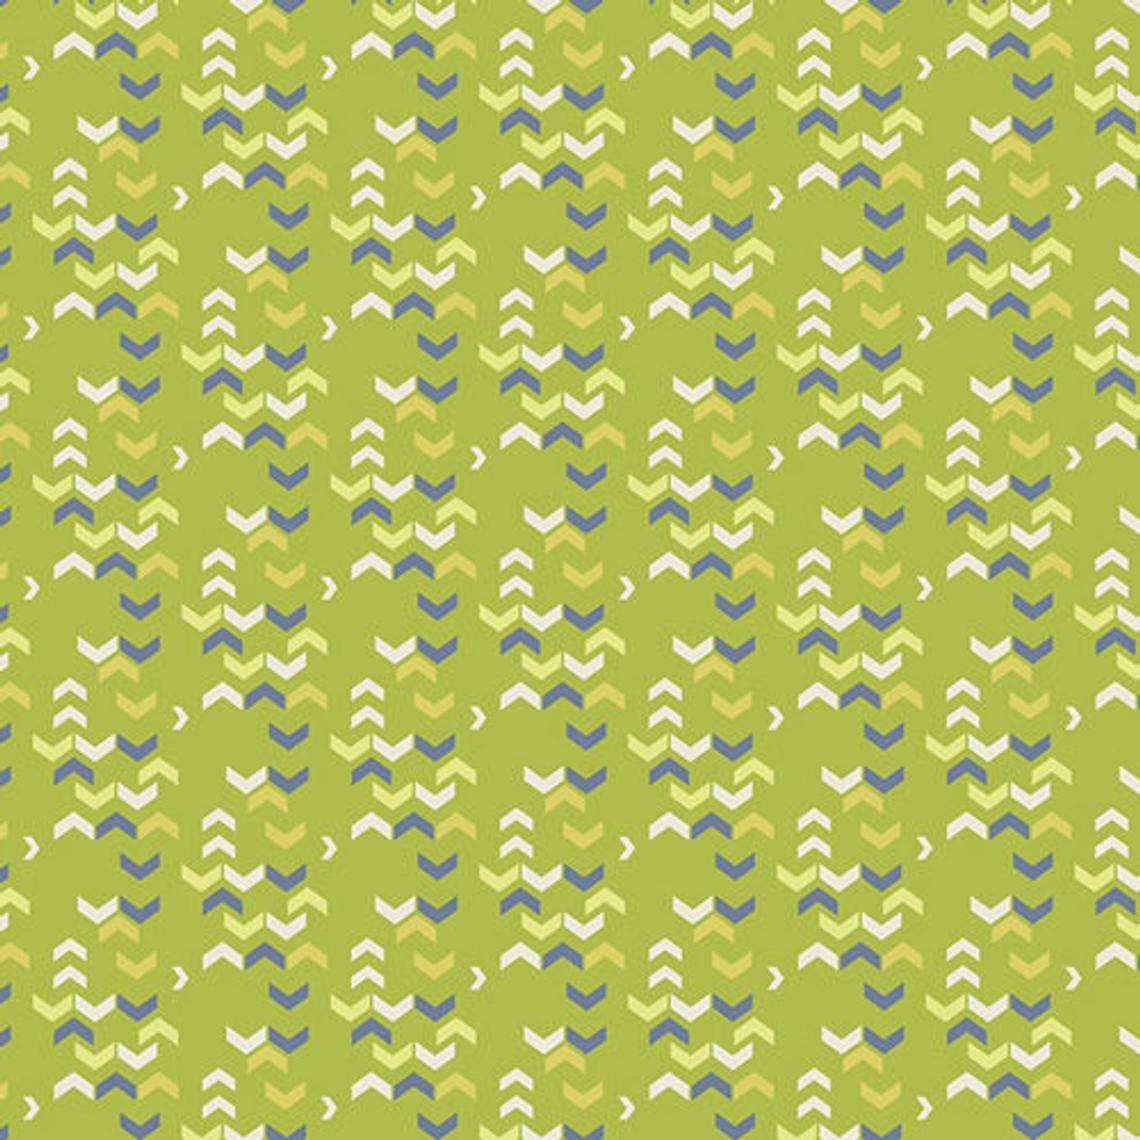 Safari Moon by Art Gallery Fabrics - SFR-6703